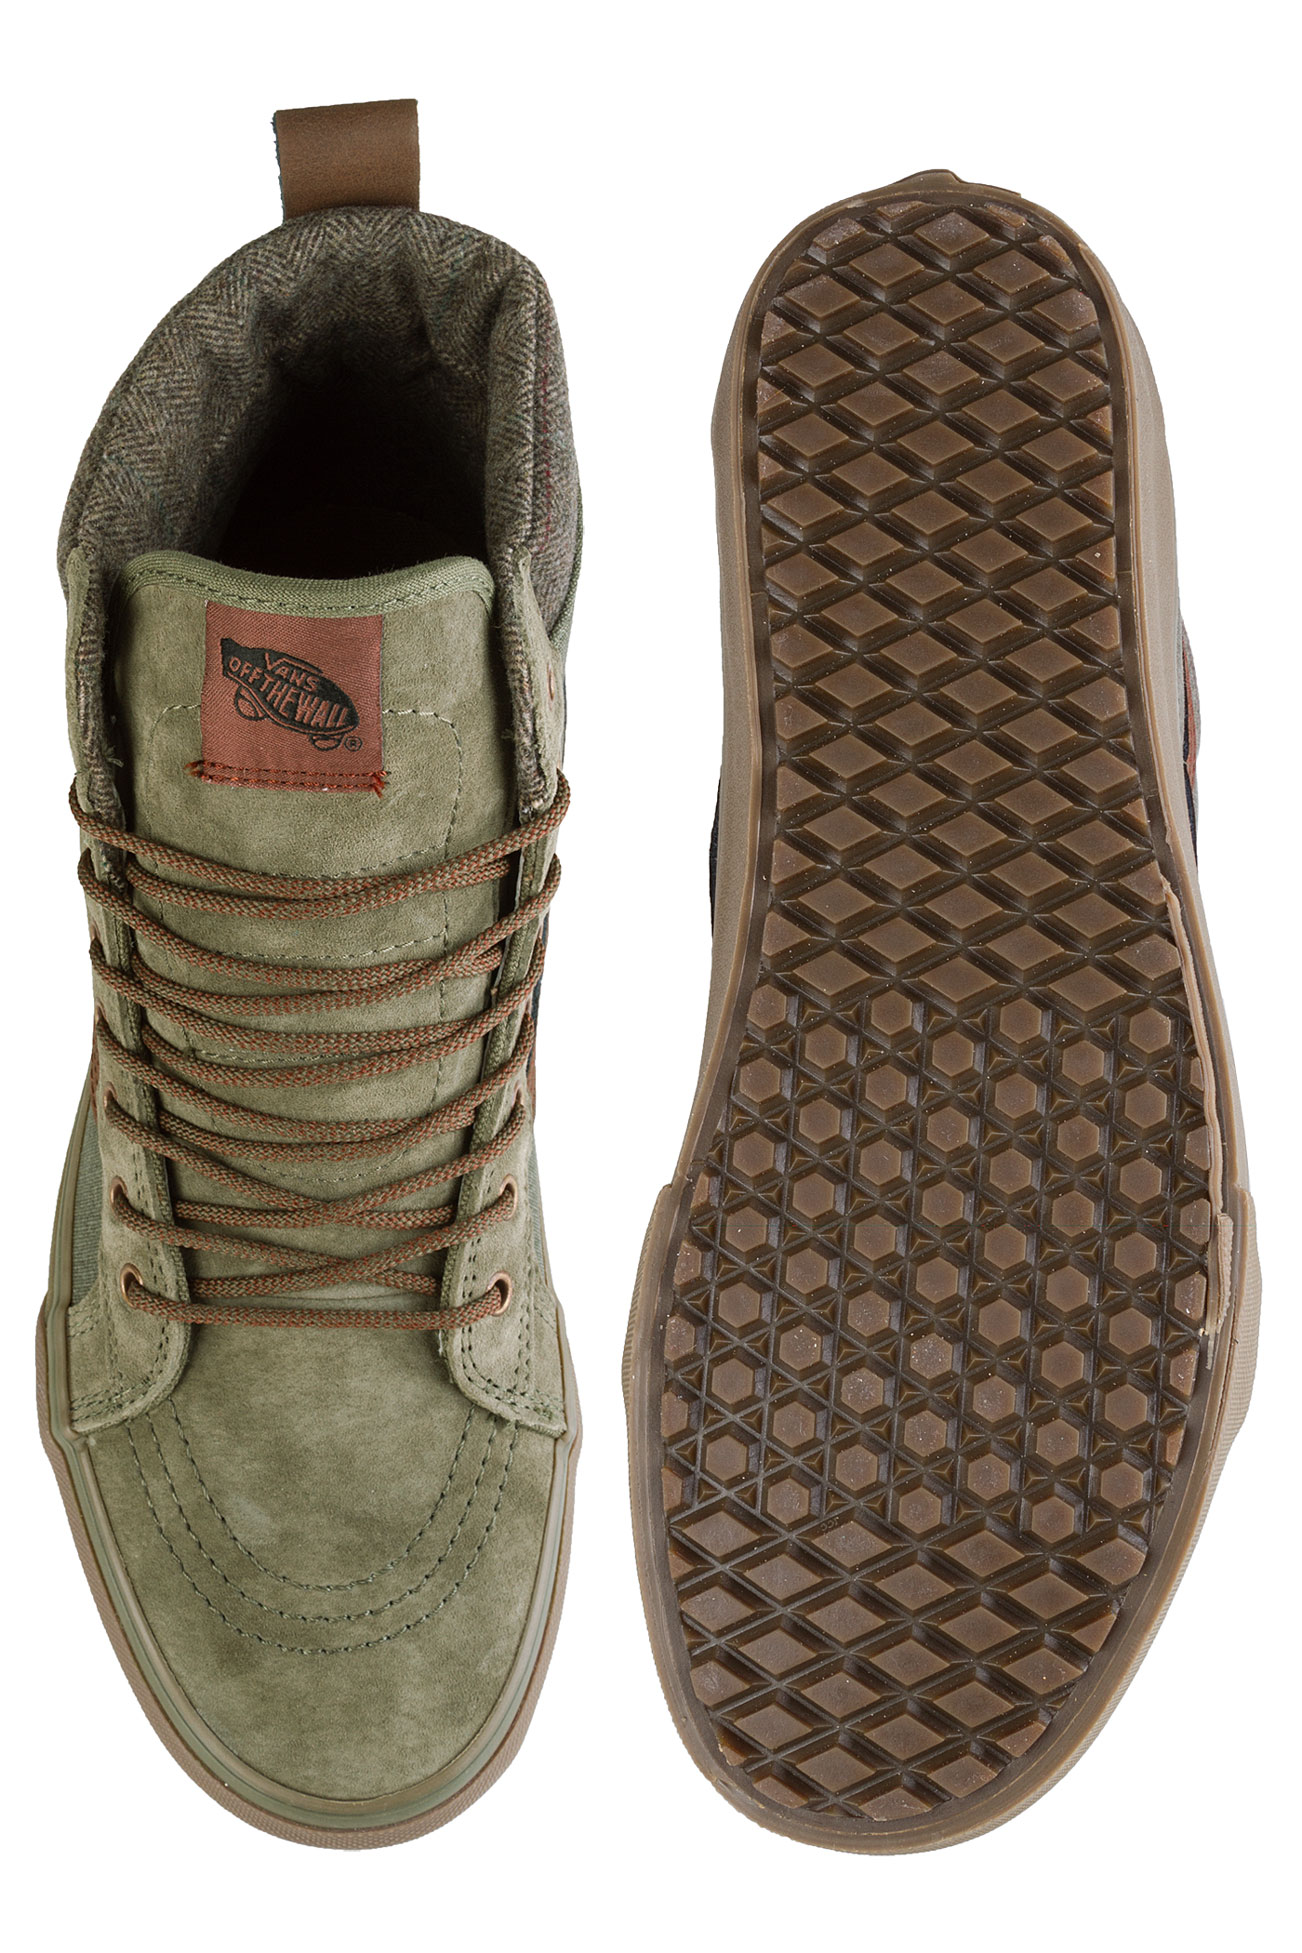 971d76d9c2d Vans Sk8-Hi MTE DX Shoe (ivy green dark gum) buy at skatedeluxe